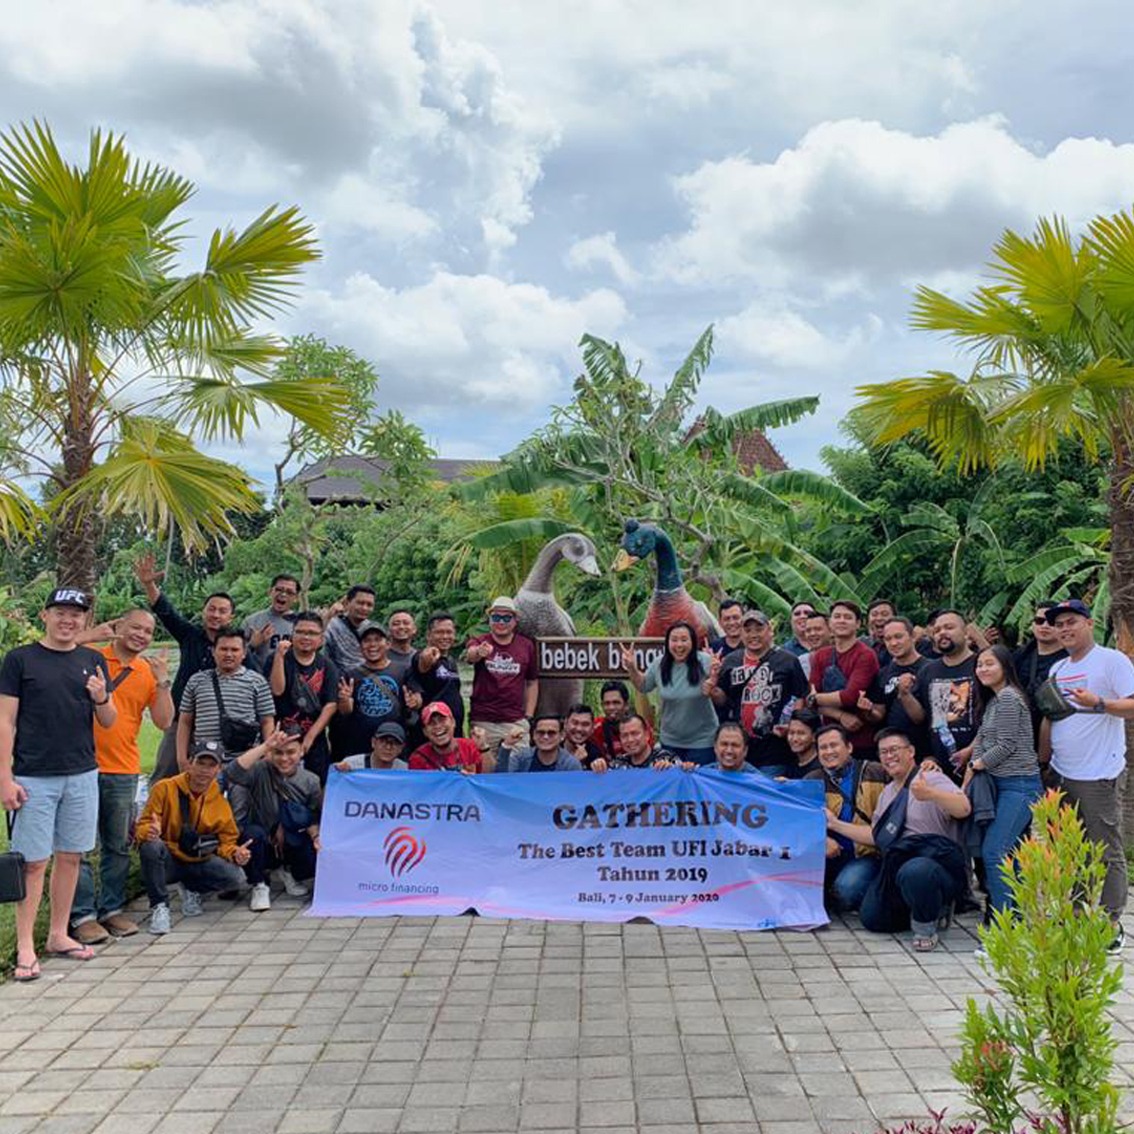 Gathering Danastra Microfinancing at Bebek Bengil Ubud